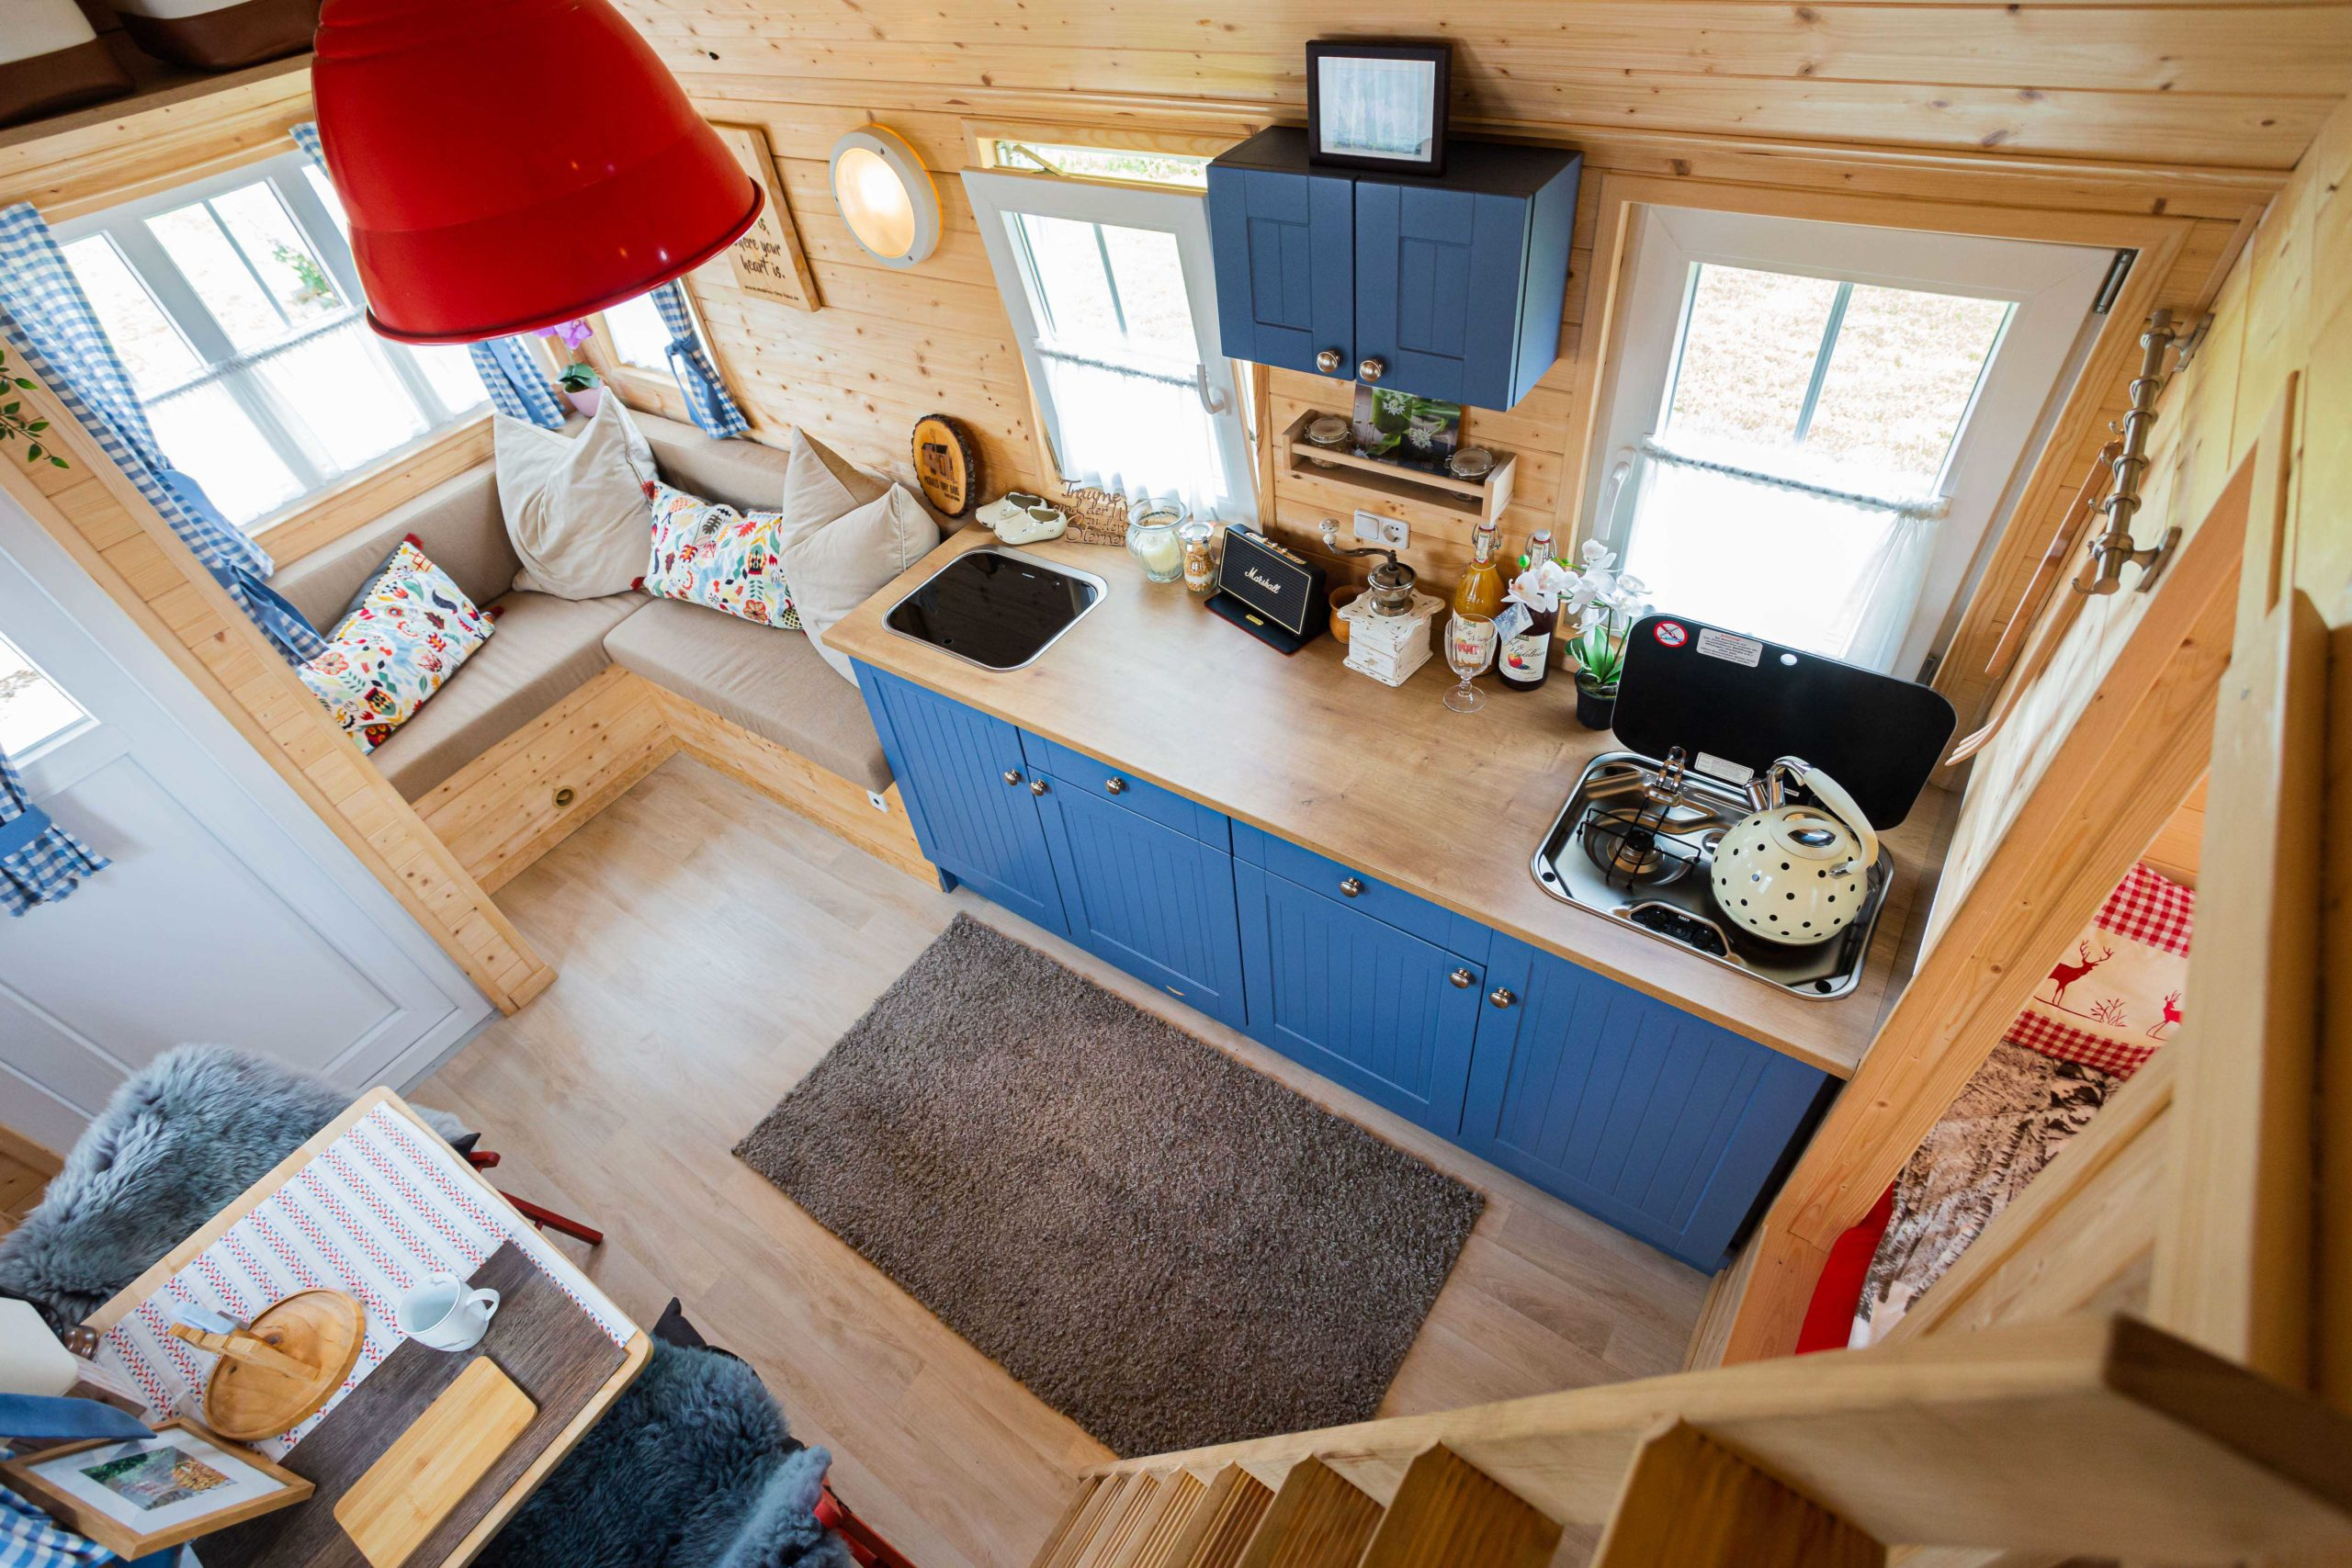 mobiles-tiny-house-island-vital-camp-gmbh-26